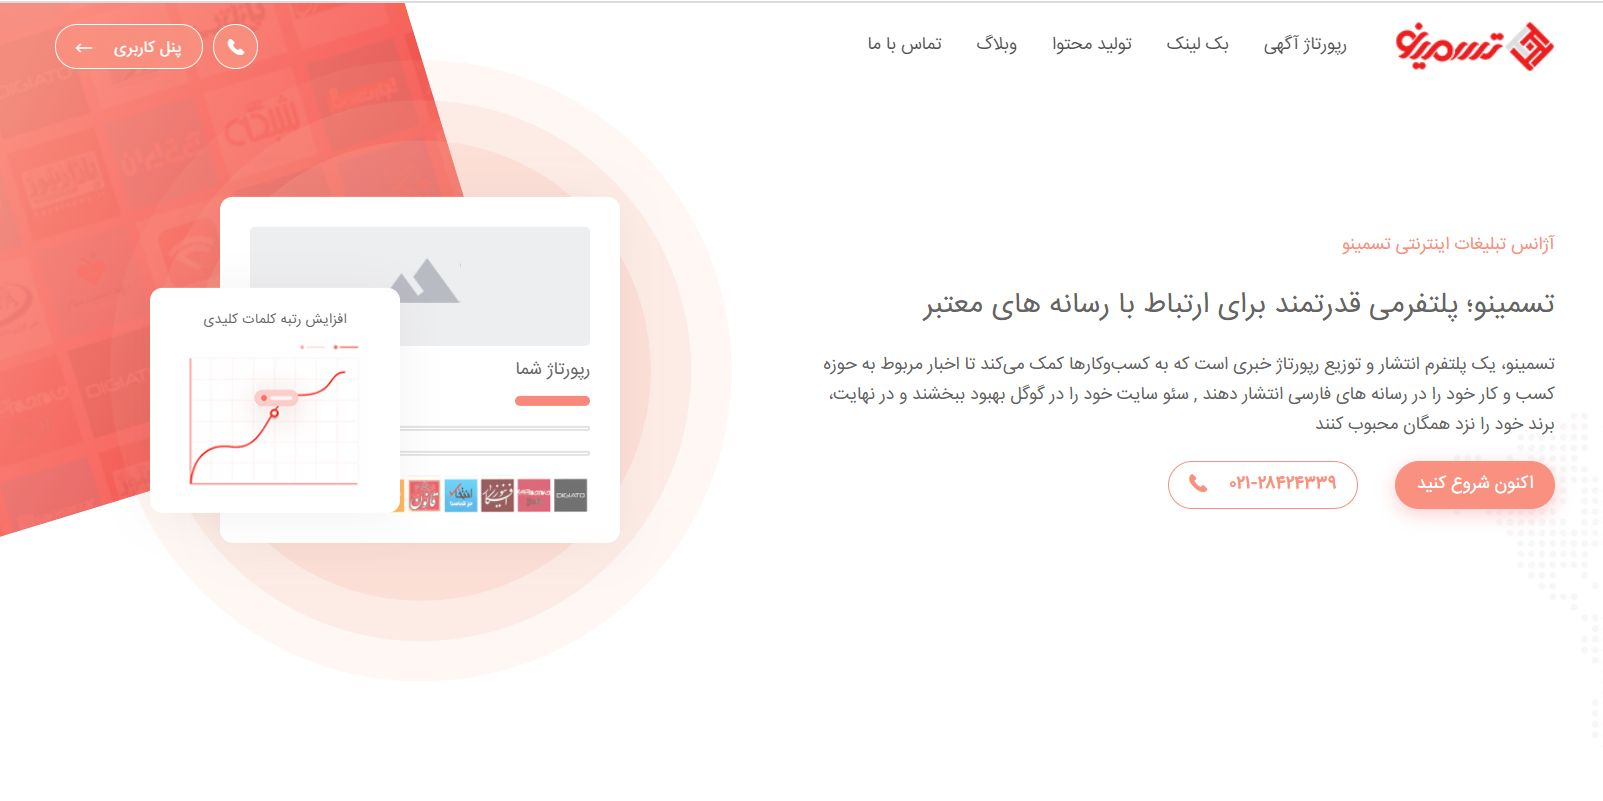 تسمینو پلتفرم انتشار رپورتاژ آگهی